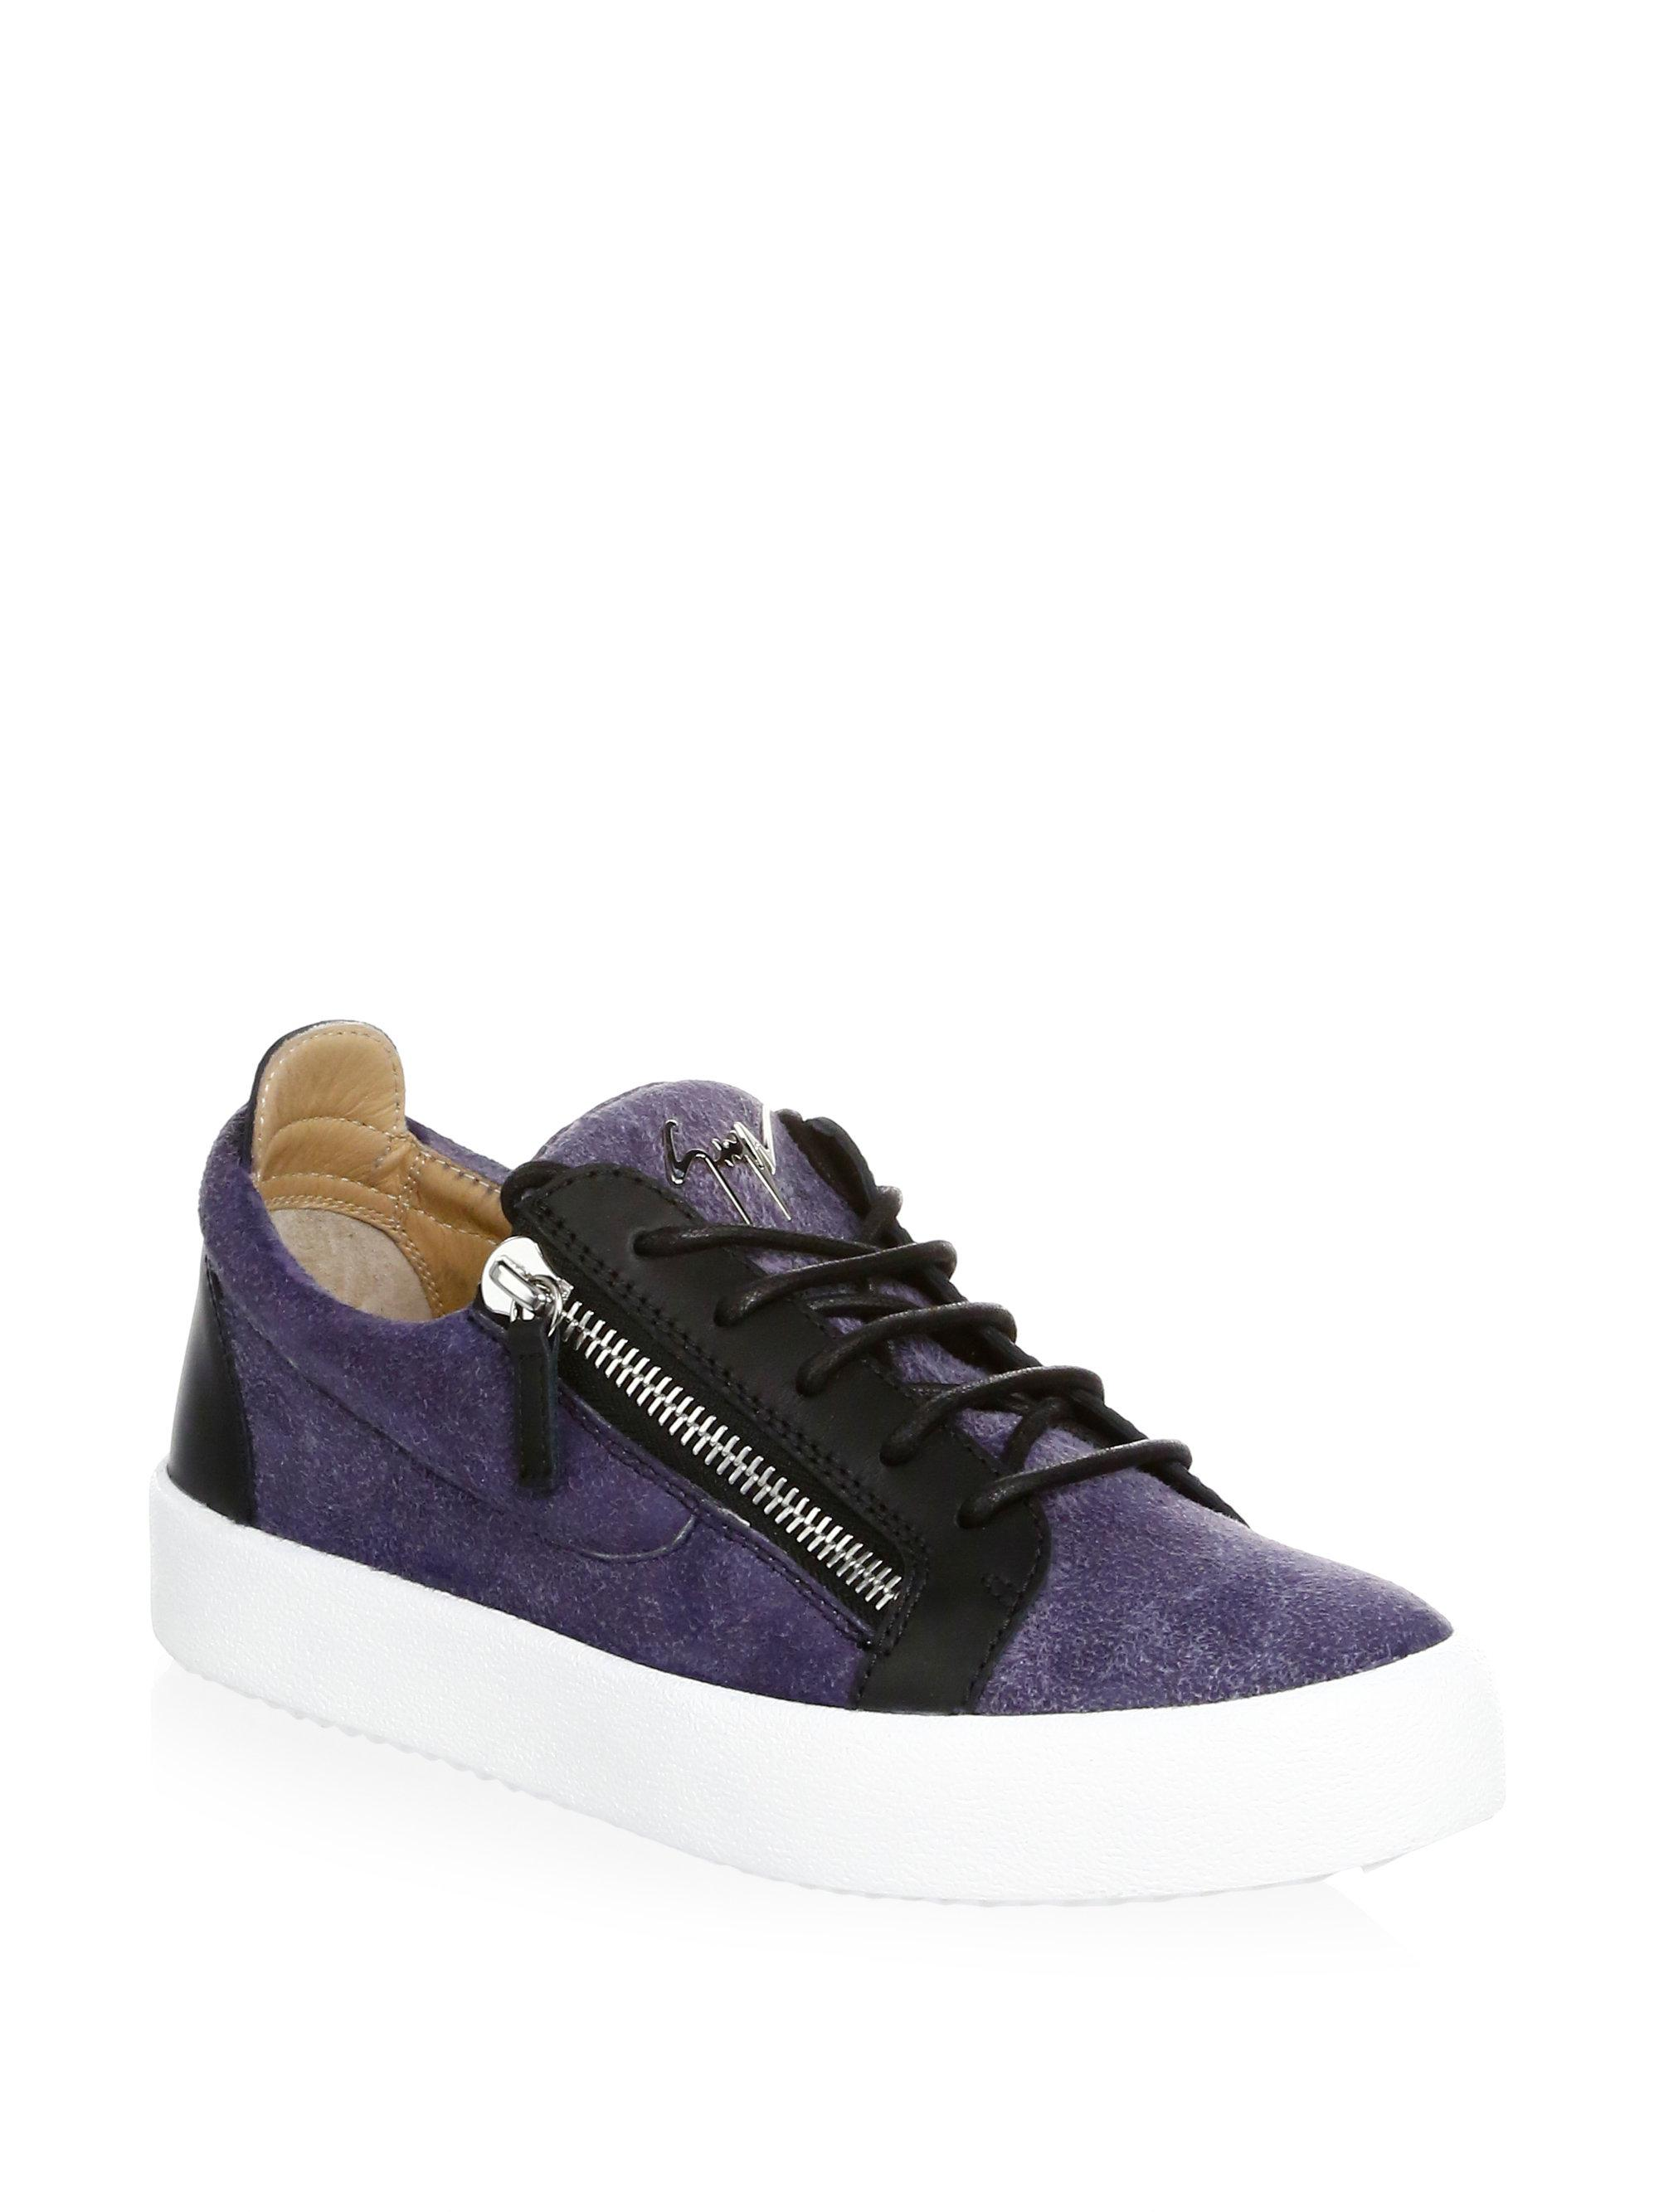 Giuseppe Zanotti Denim printed leather low-top sneaker FRANKIE qzJOt